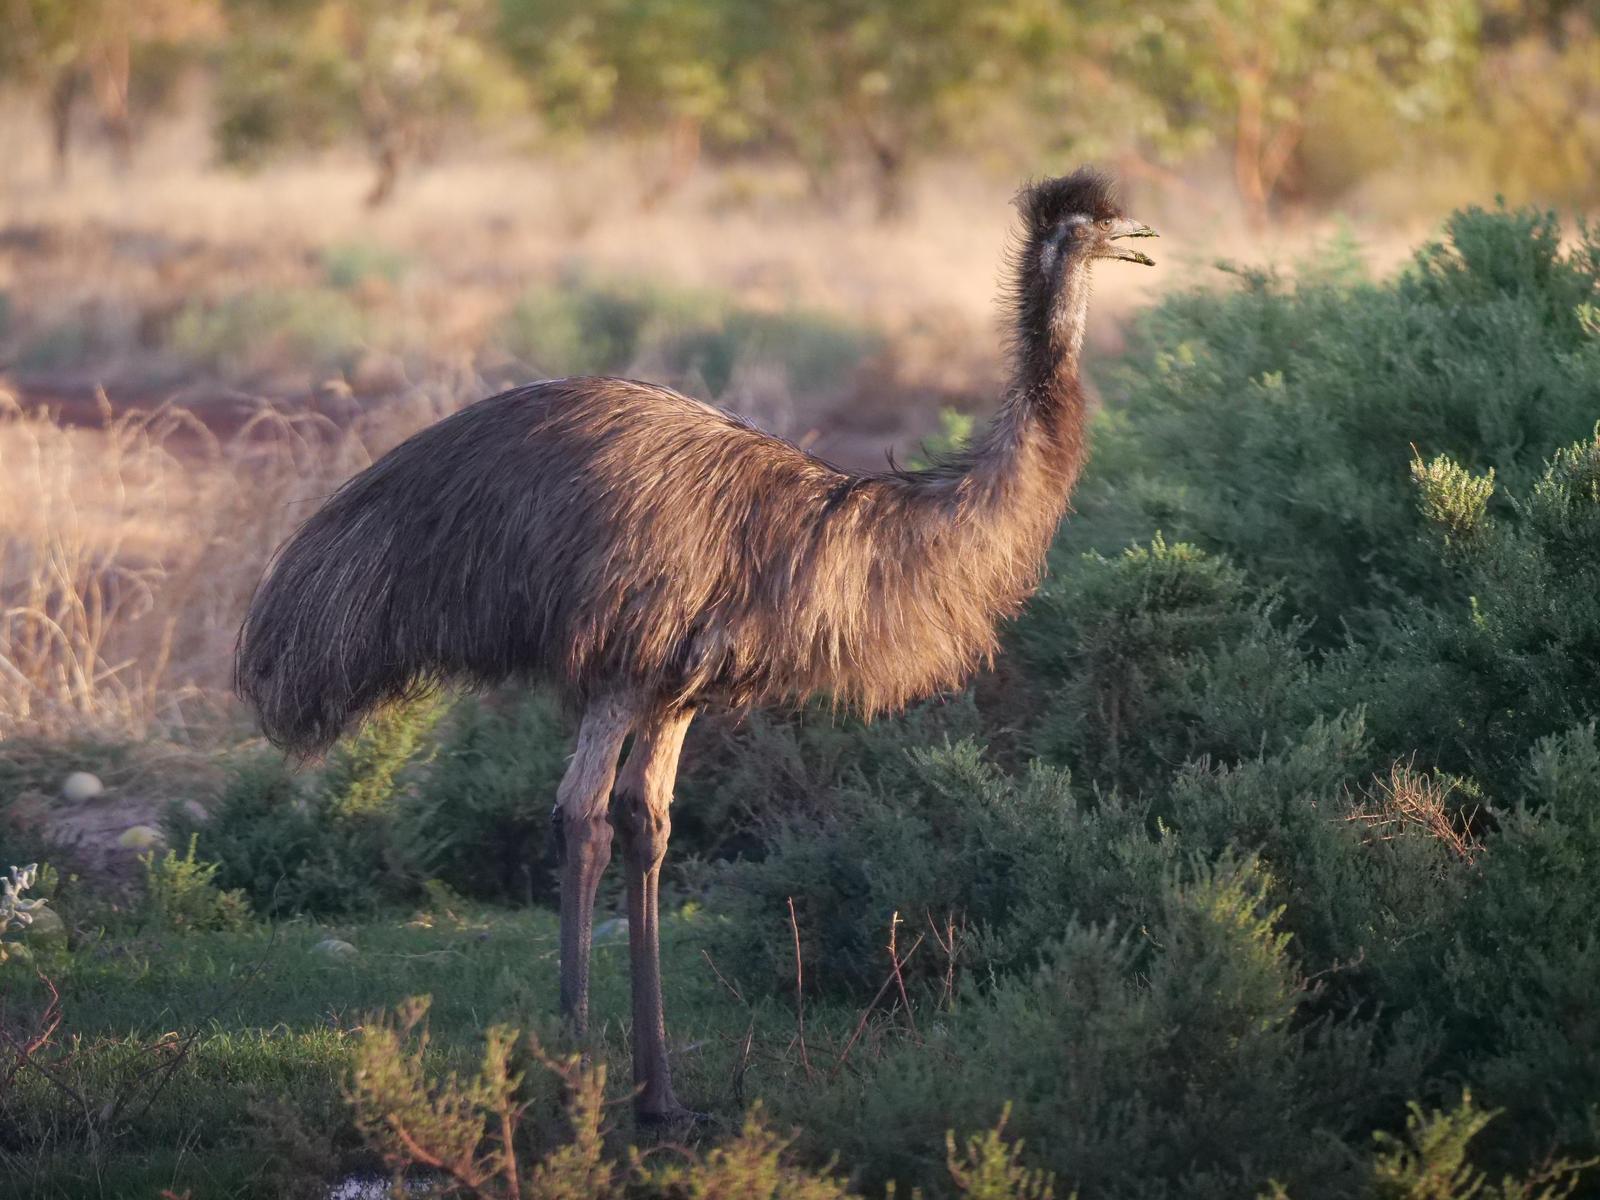 Emu Photo by Peter Lowe